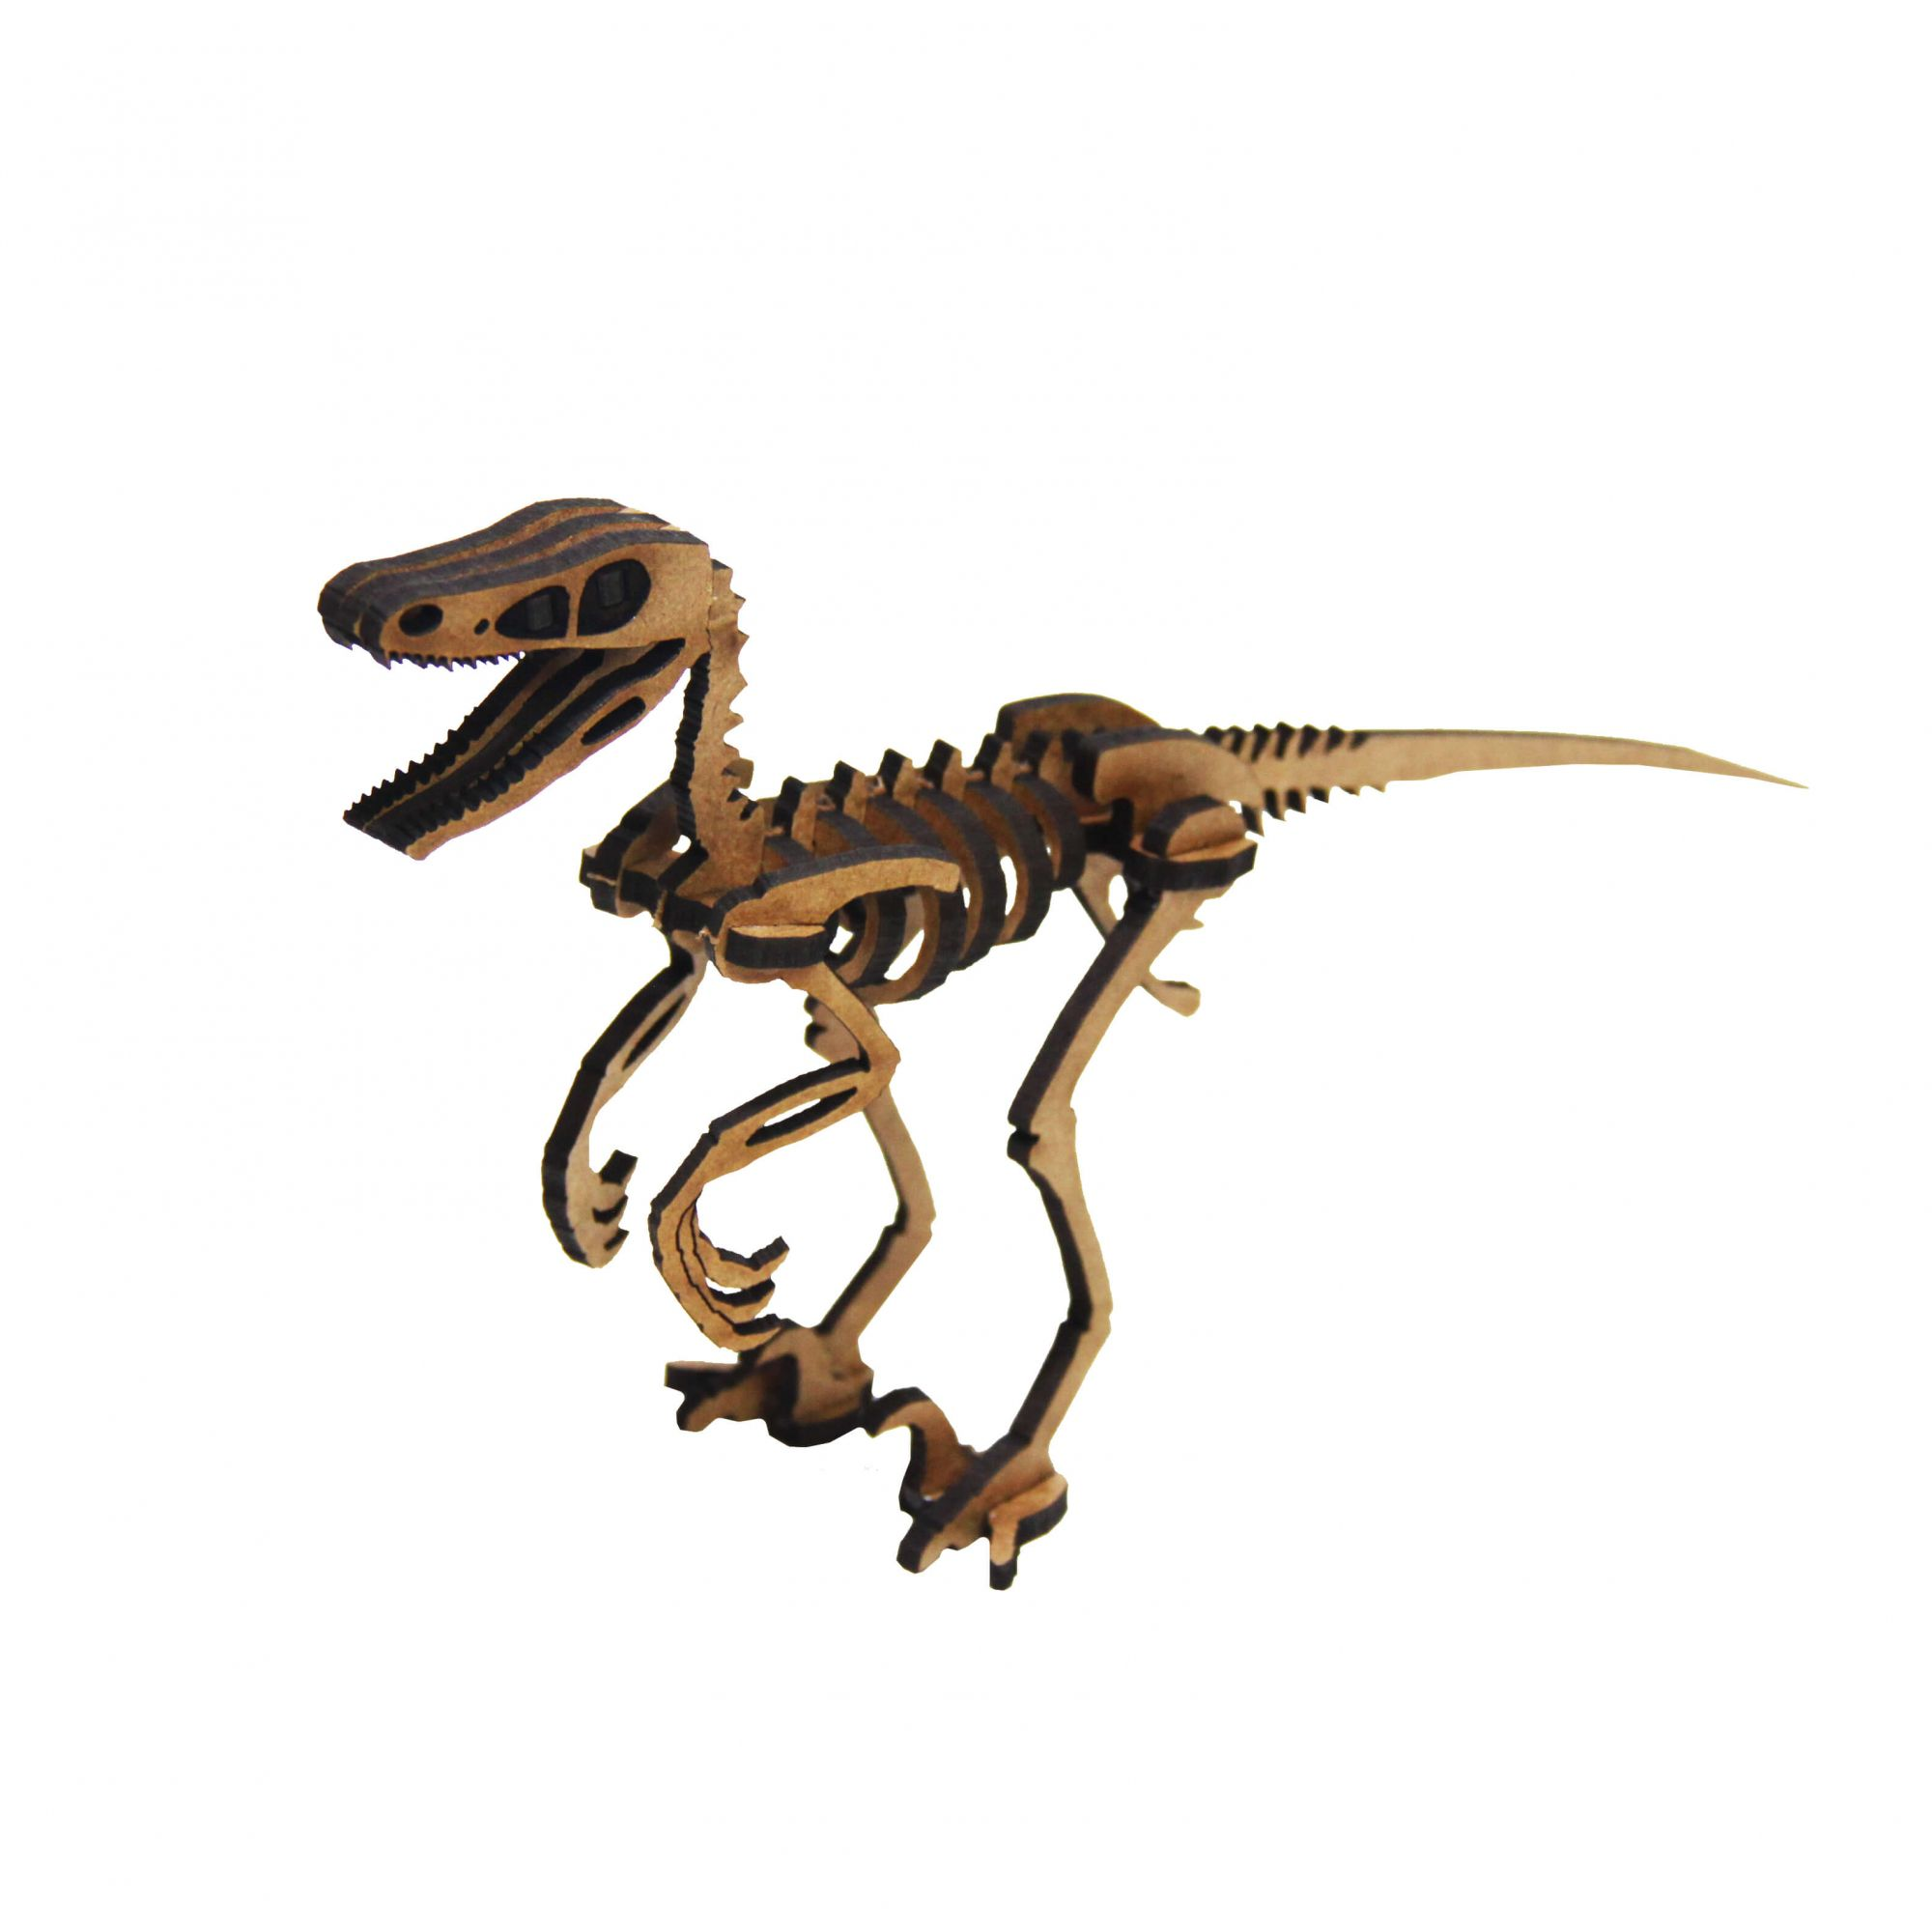 Dinossauro - Miniatura para montar Velociraptor